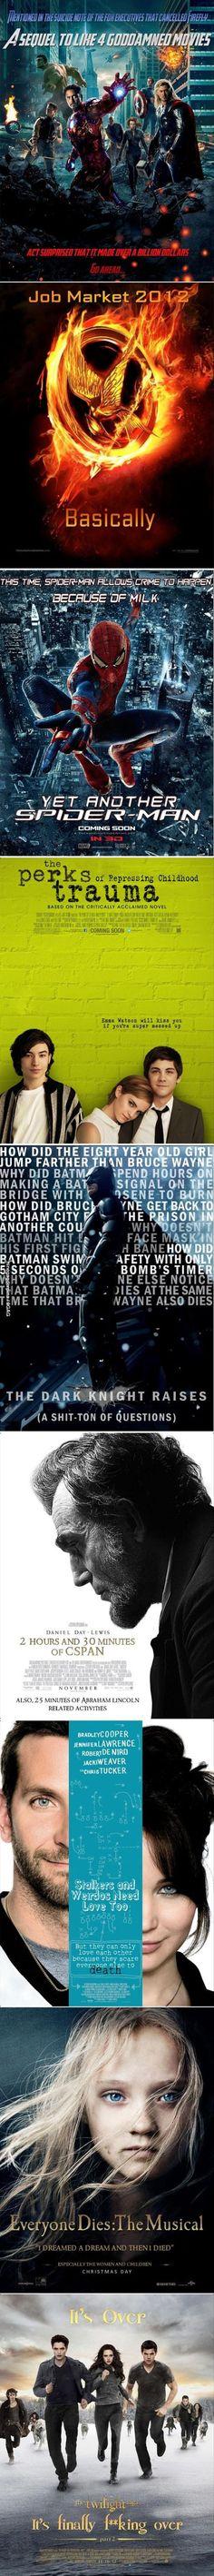 if movie titles were honest.. i LOLed